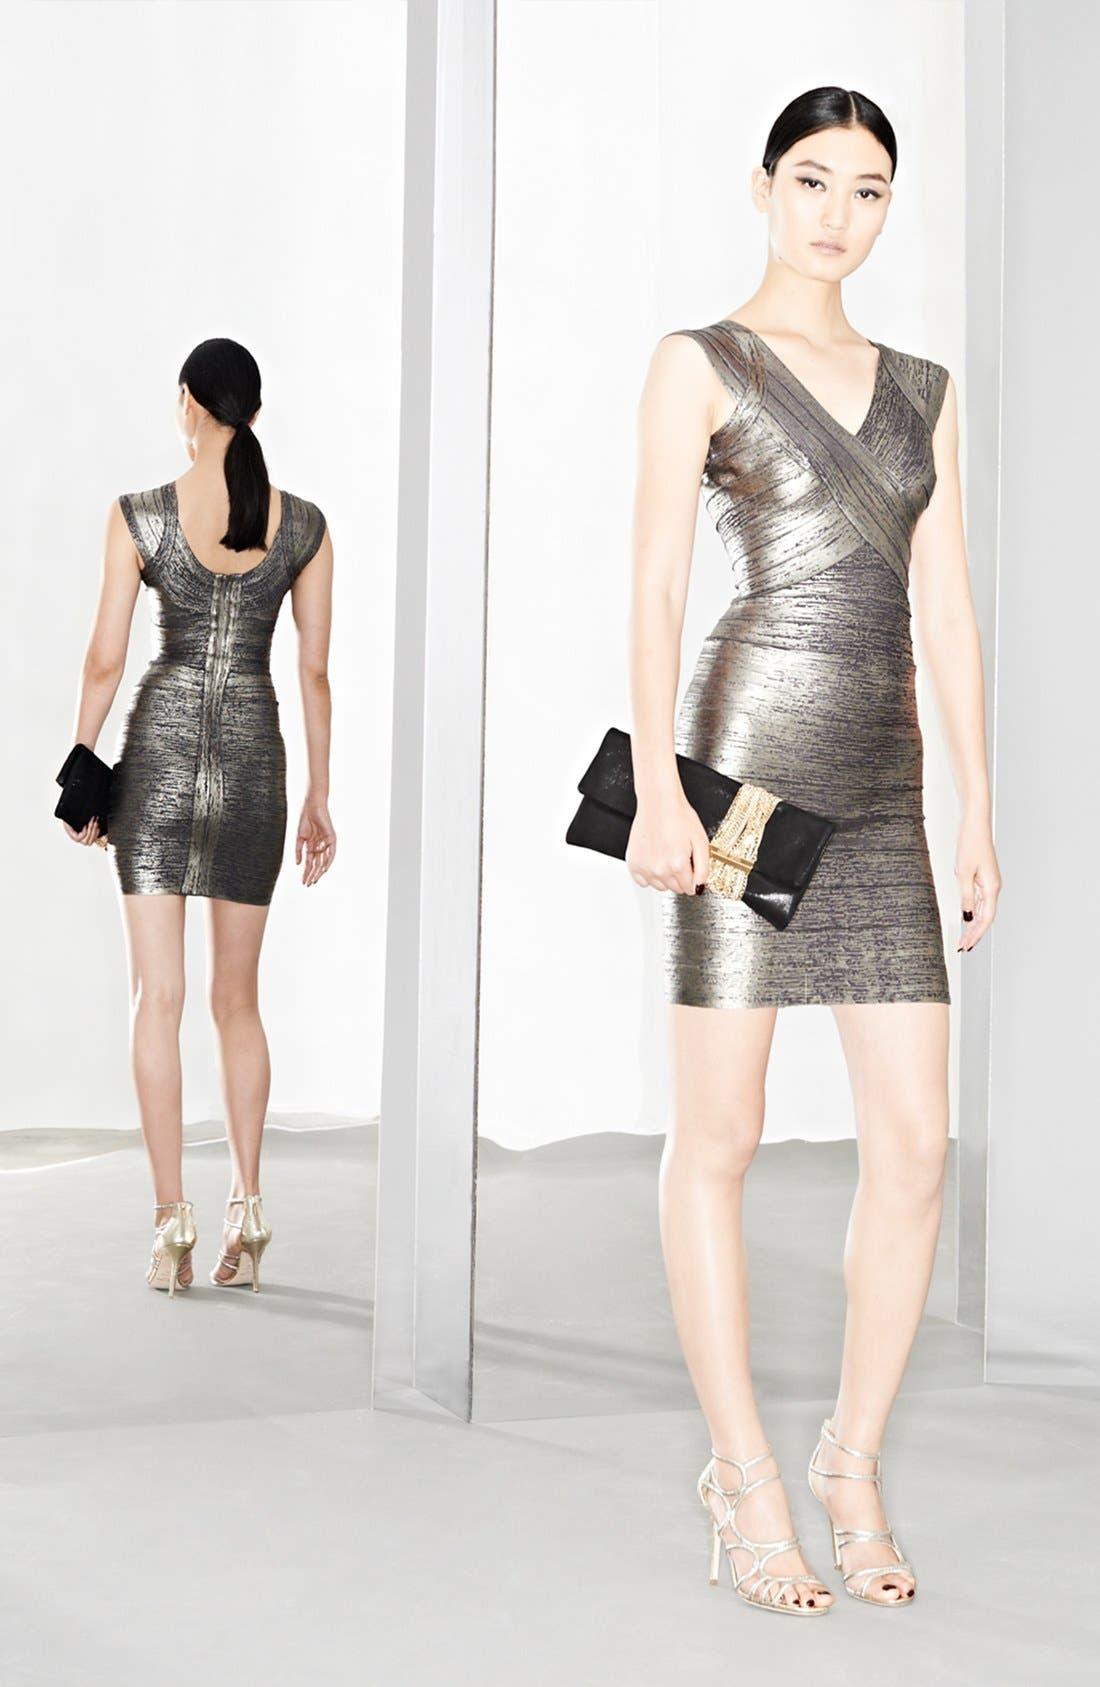 Main Image - Herve Leger Dress & Accessories